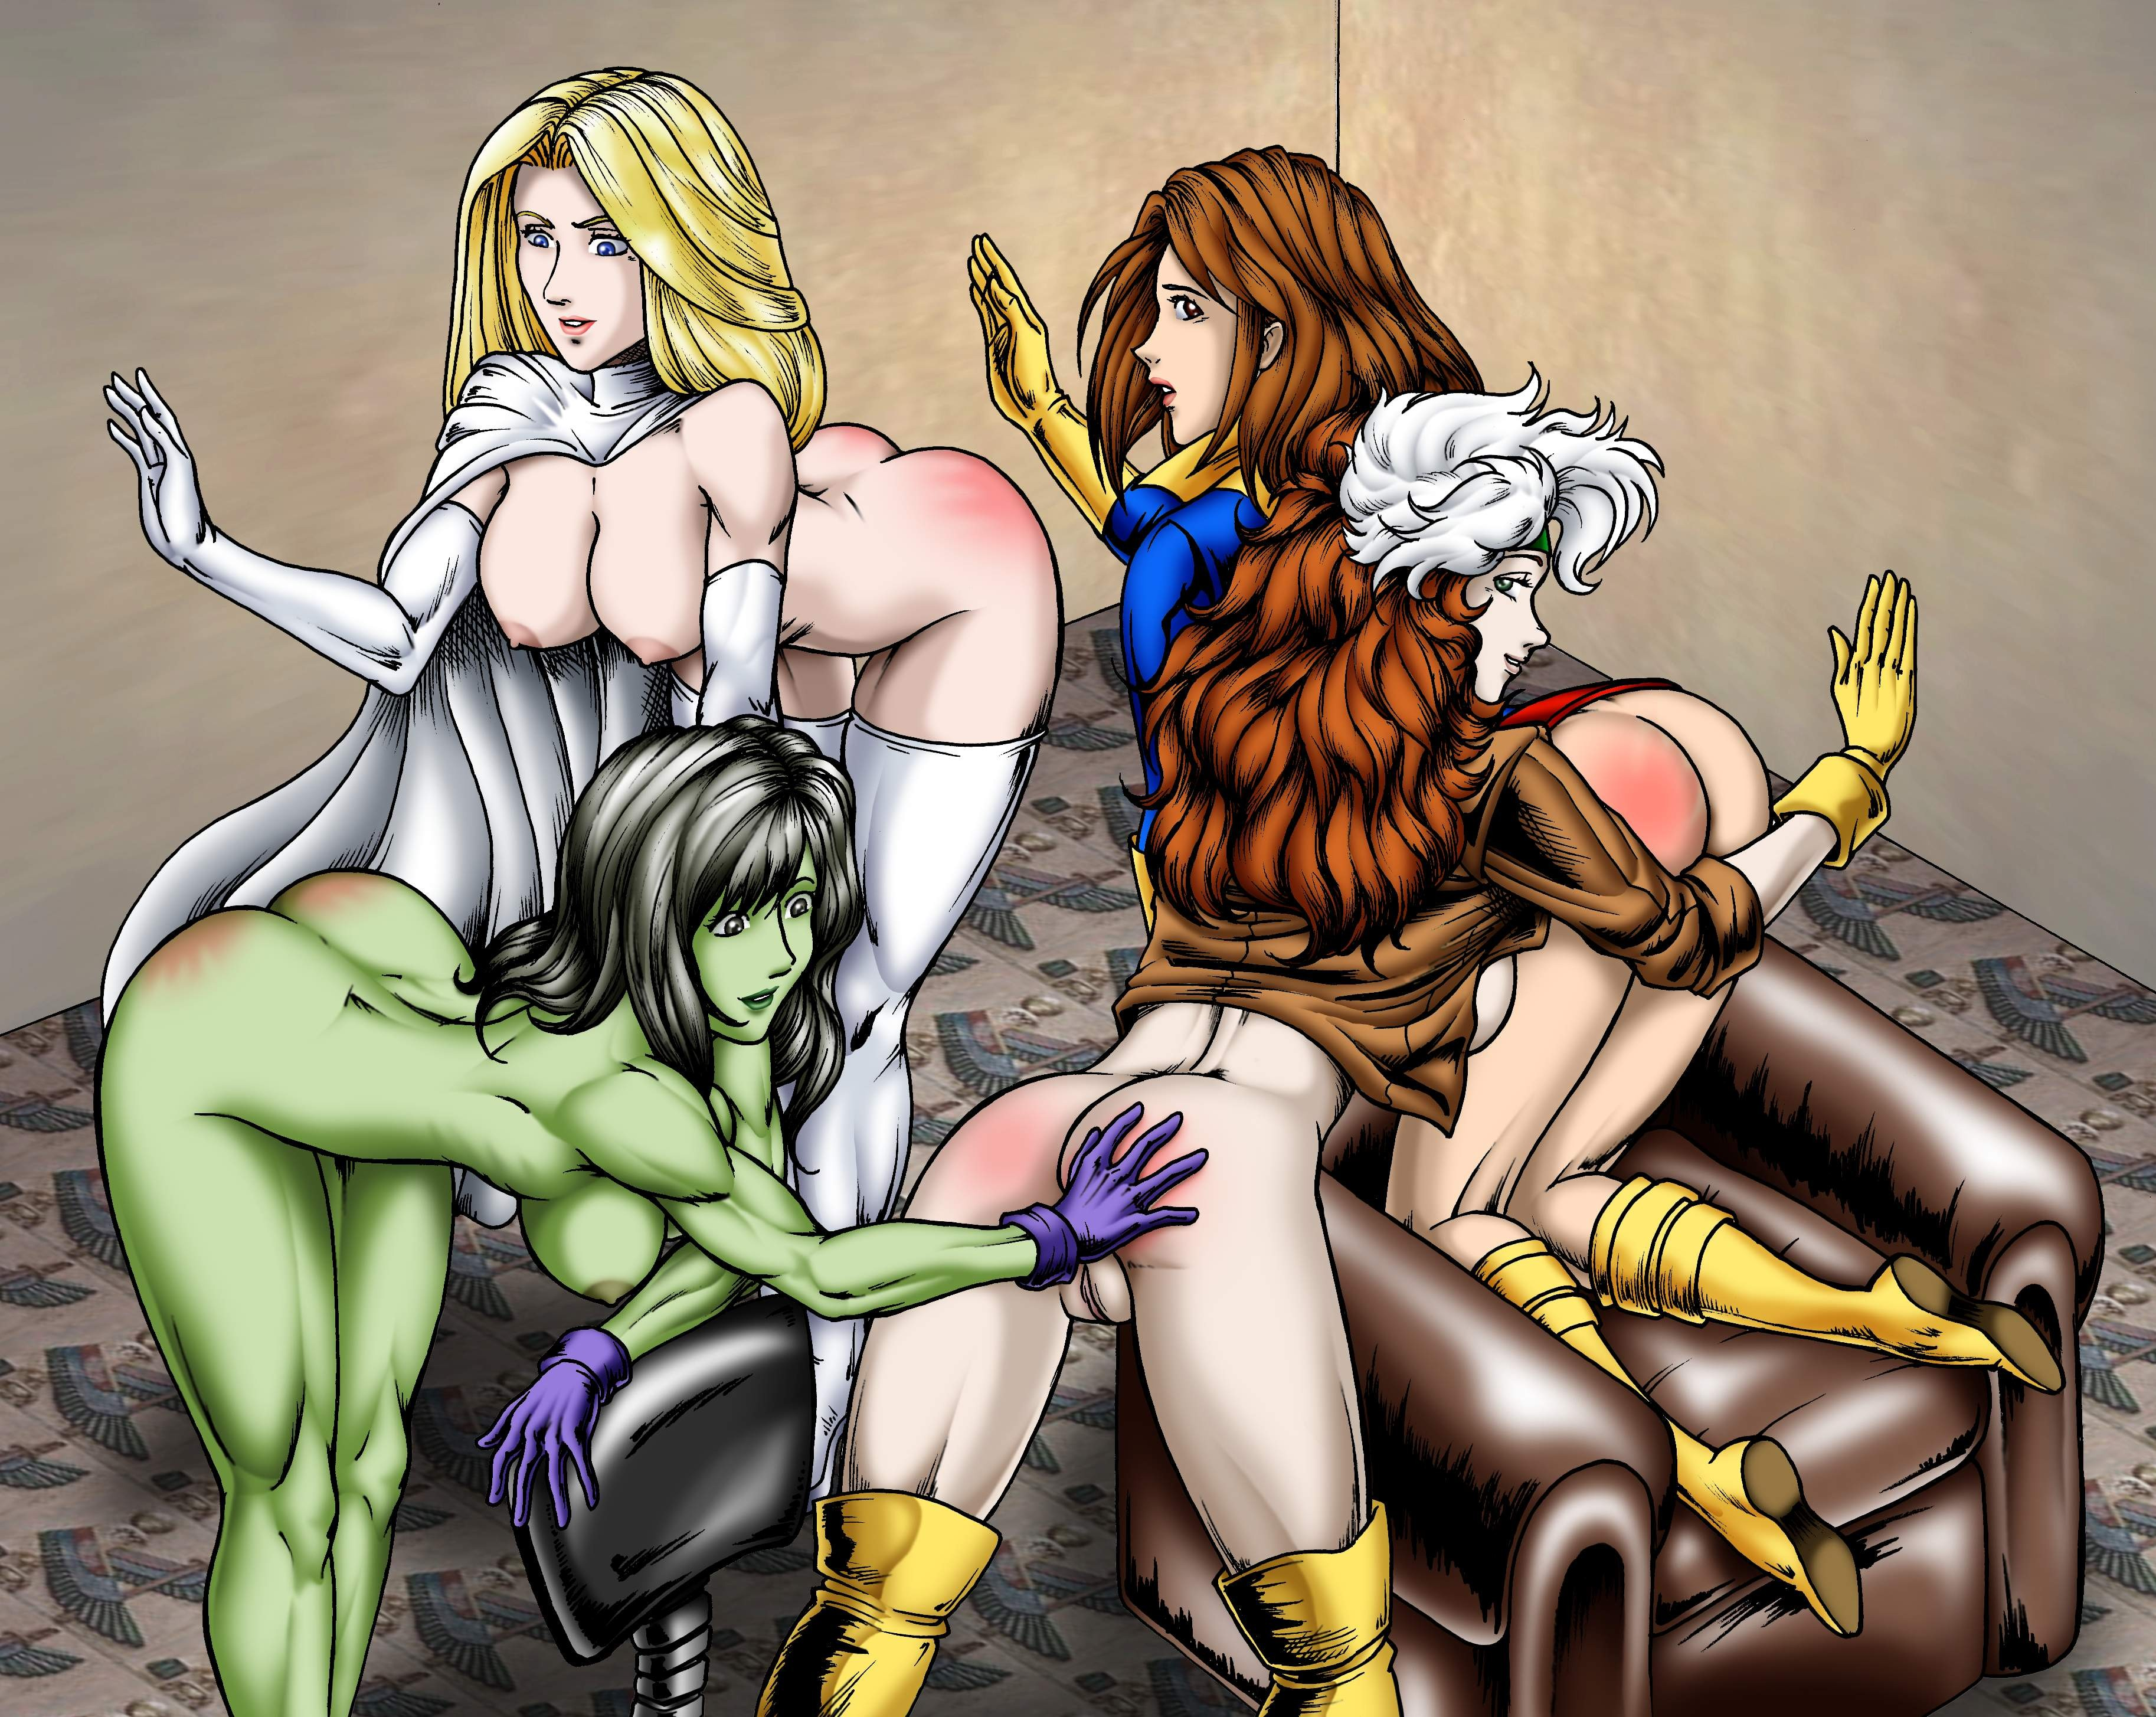 Rogue cartoon hentai erotica scene